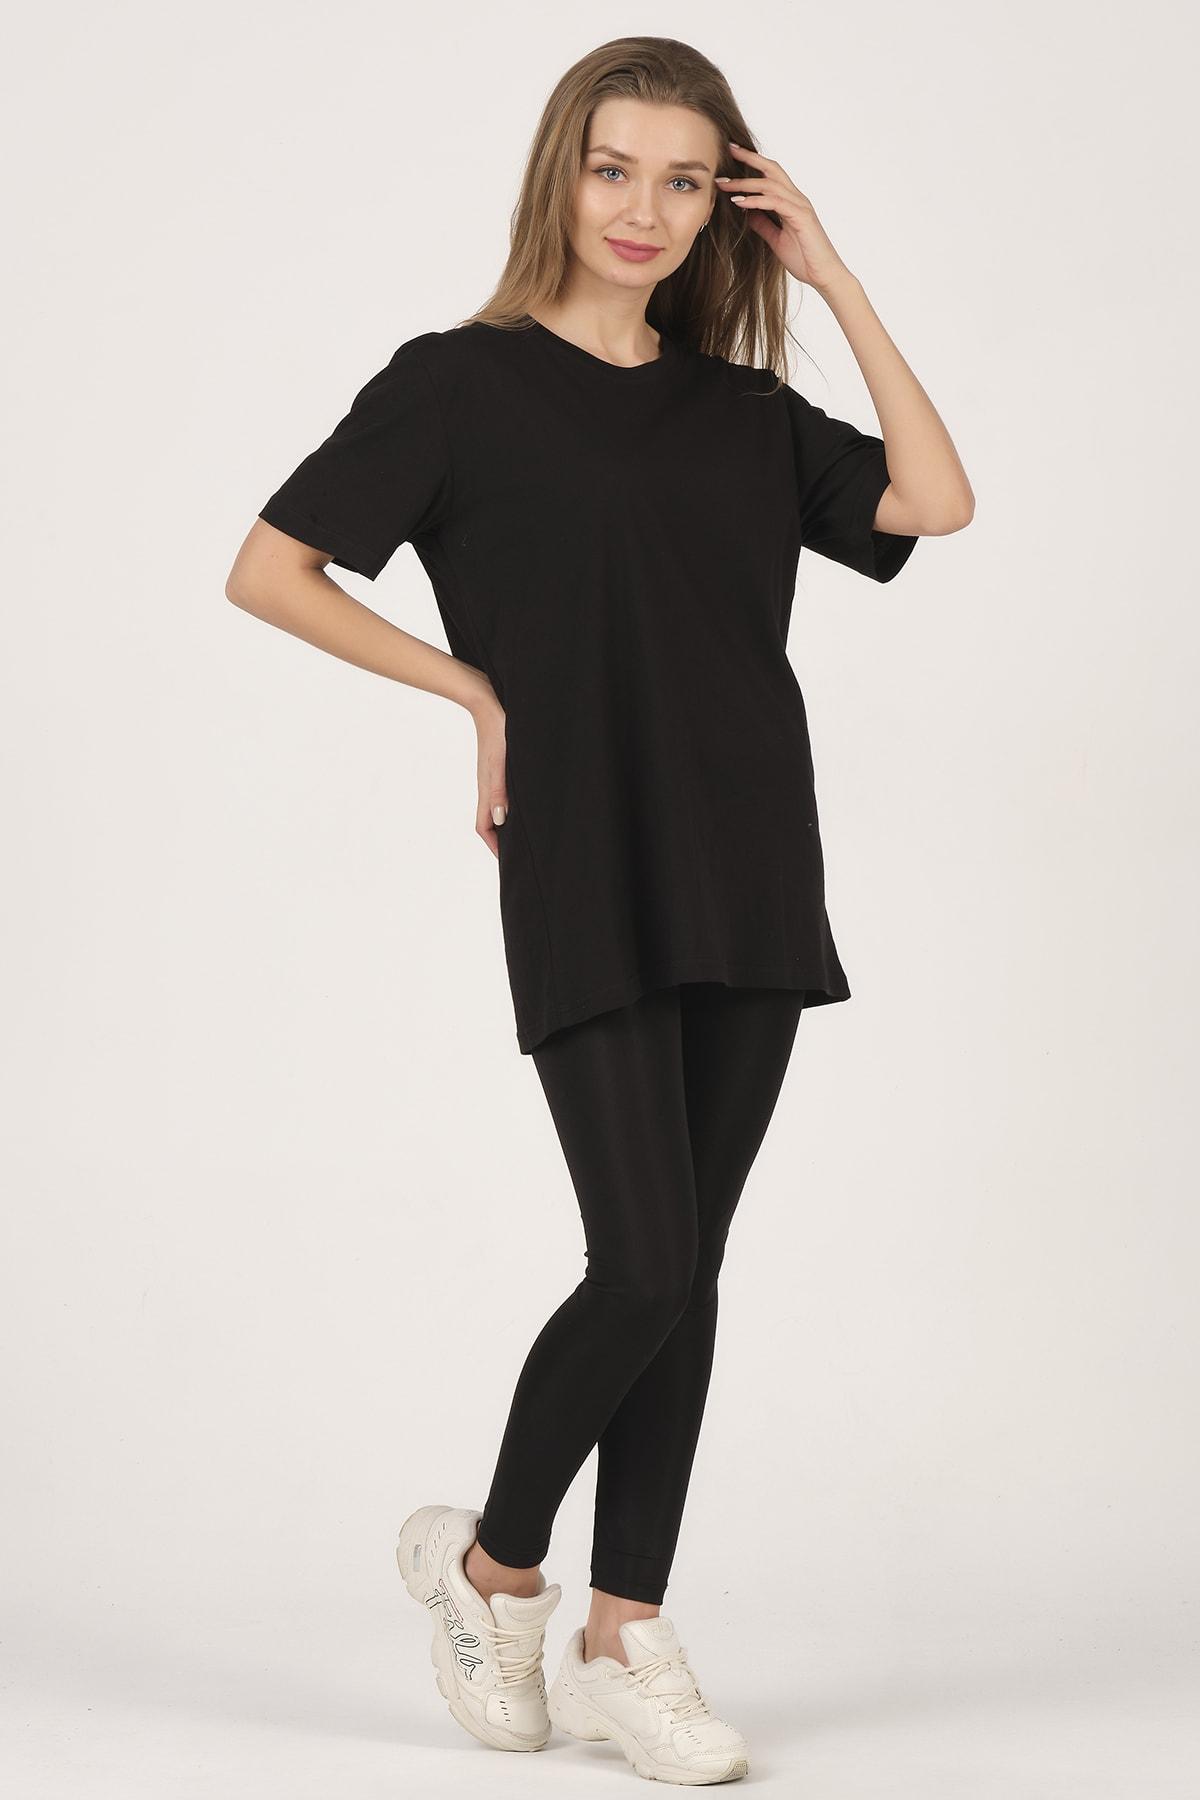 citadium Kadın Siyah Bisiklet Yaka Kısa Kollu Basic T-shirt %100 Pamuk 1